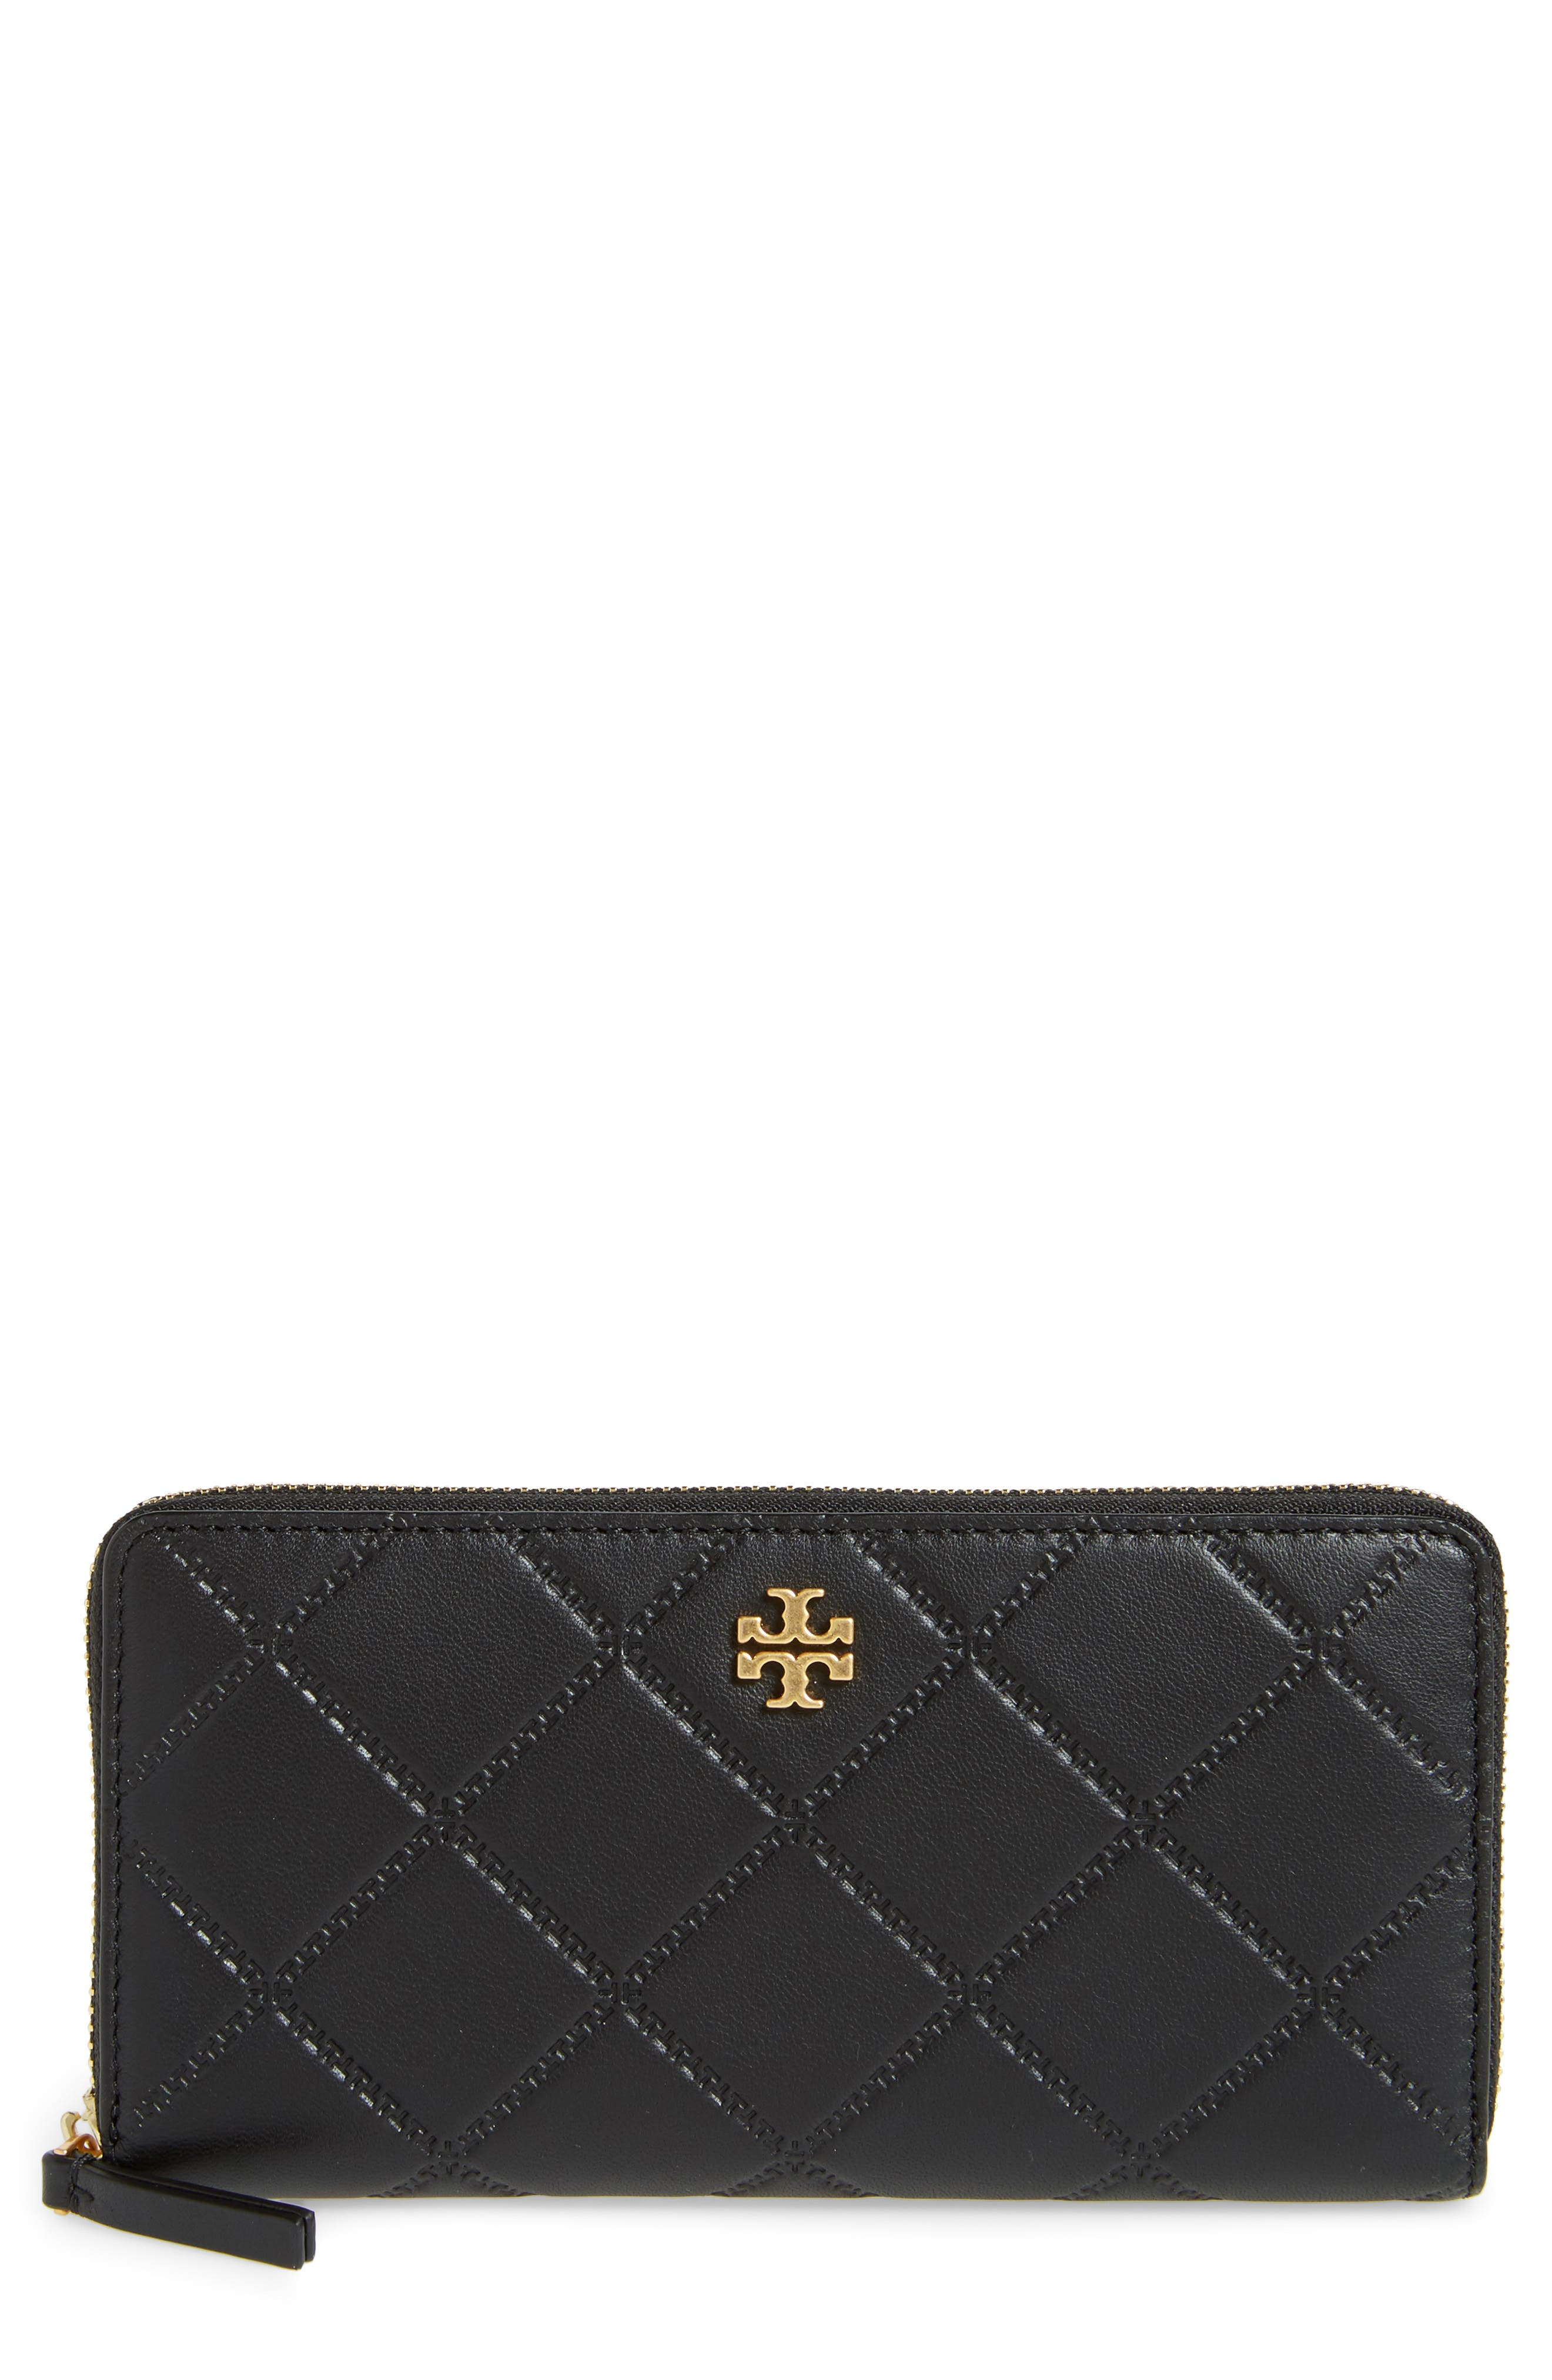 Georgia Zip Continental Wallet,                         Main,                         color, Black